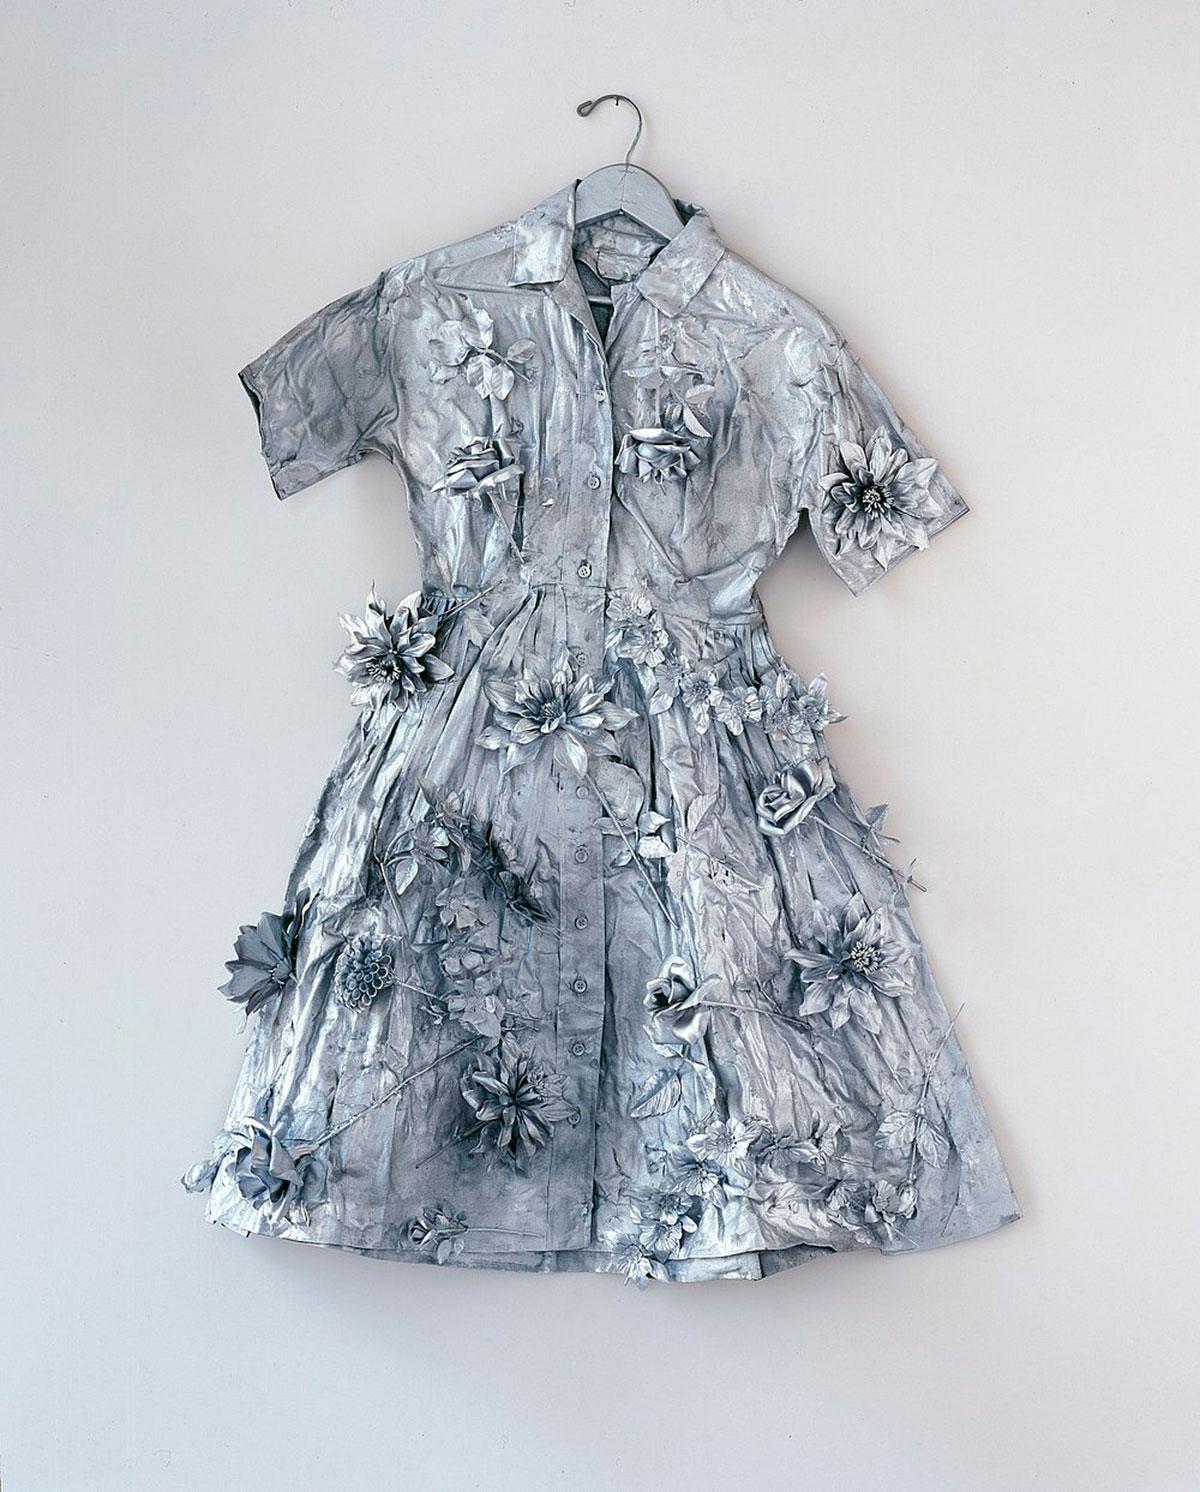 Yayoi Kusama, Silver Dress, 1966, © Yayoi Kusama Photo: mumok, Museum moderner Kunst Stiftung Ludwig Wien, ehemals Sammlung Hahn, Köln